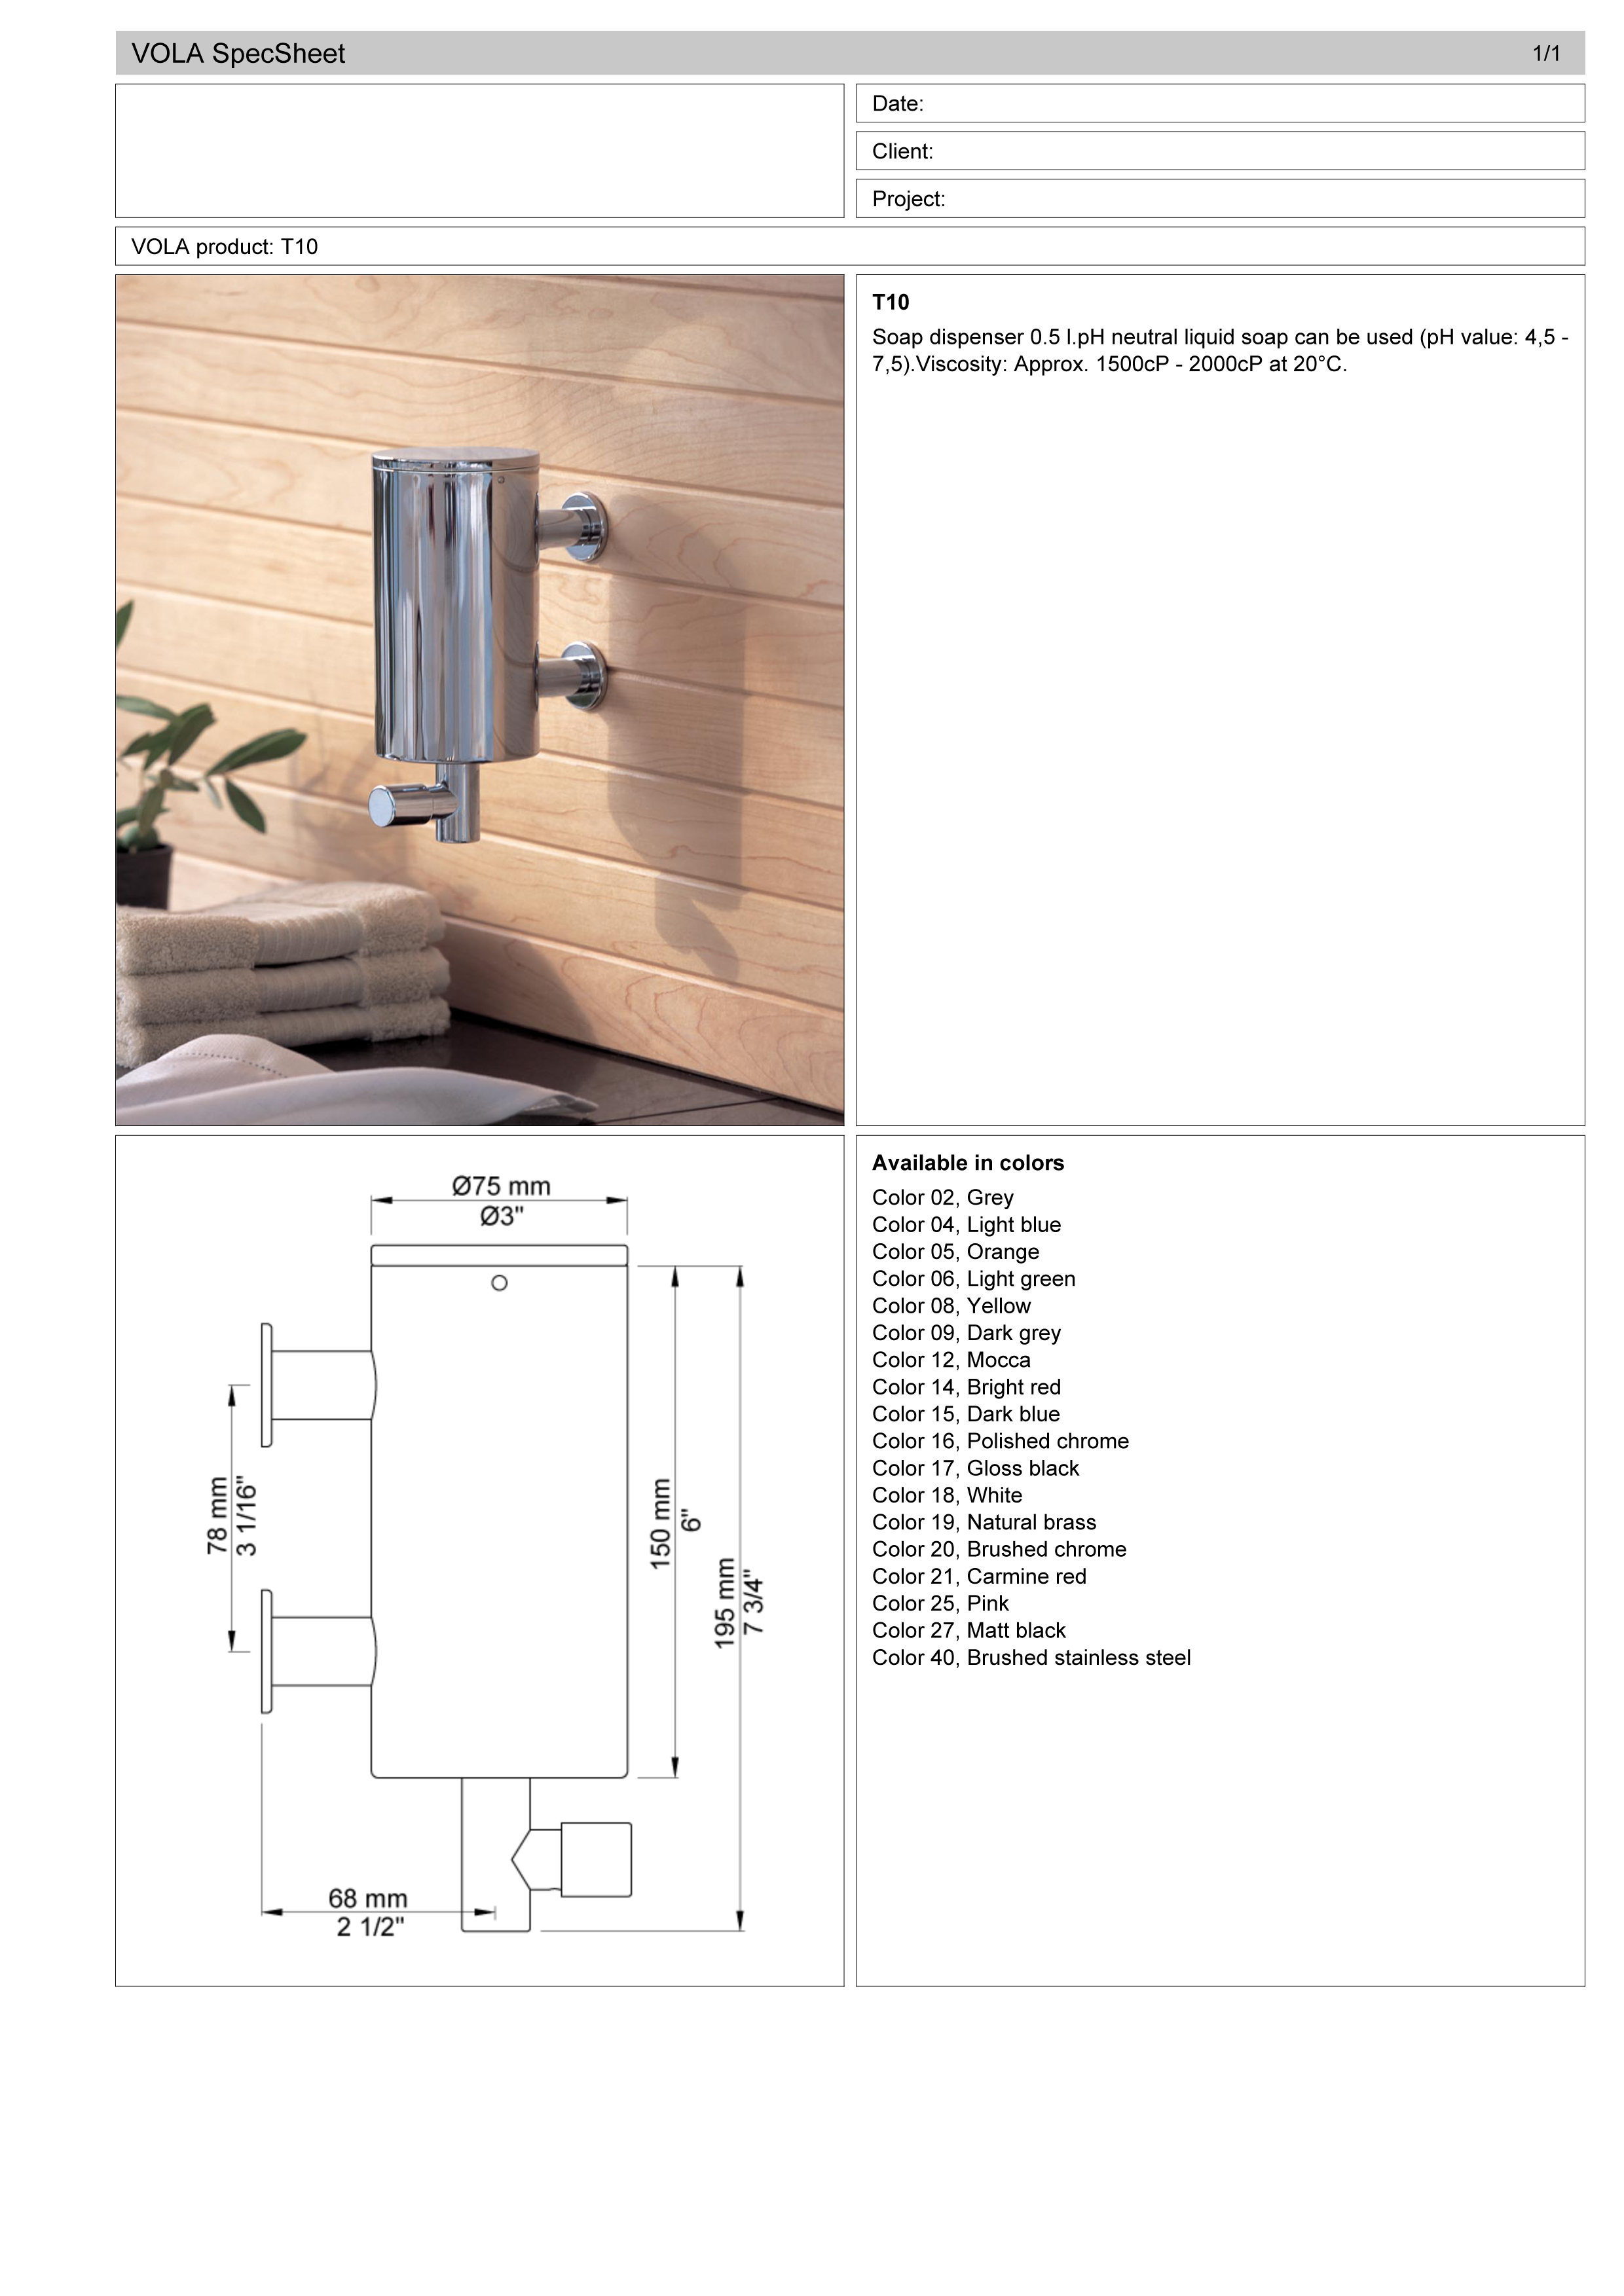 Vola T10.16 wall mount soap dispenser spec sheet.jpg